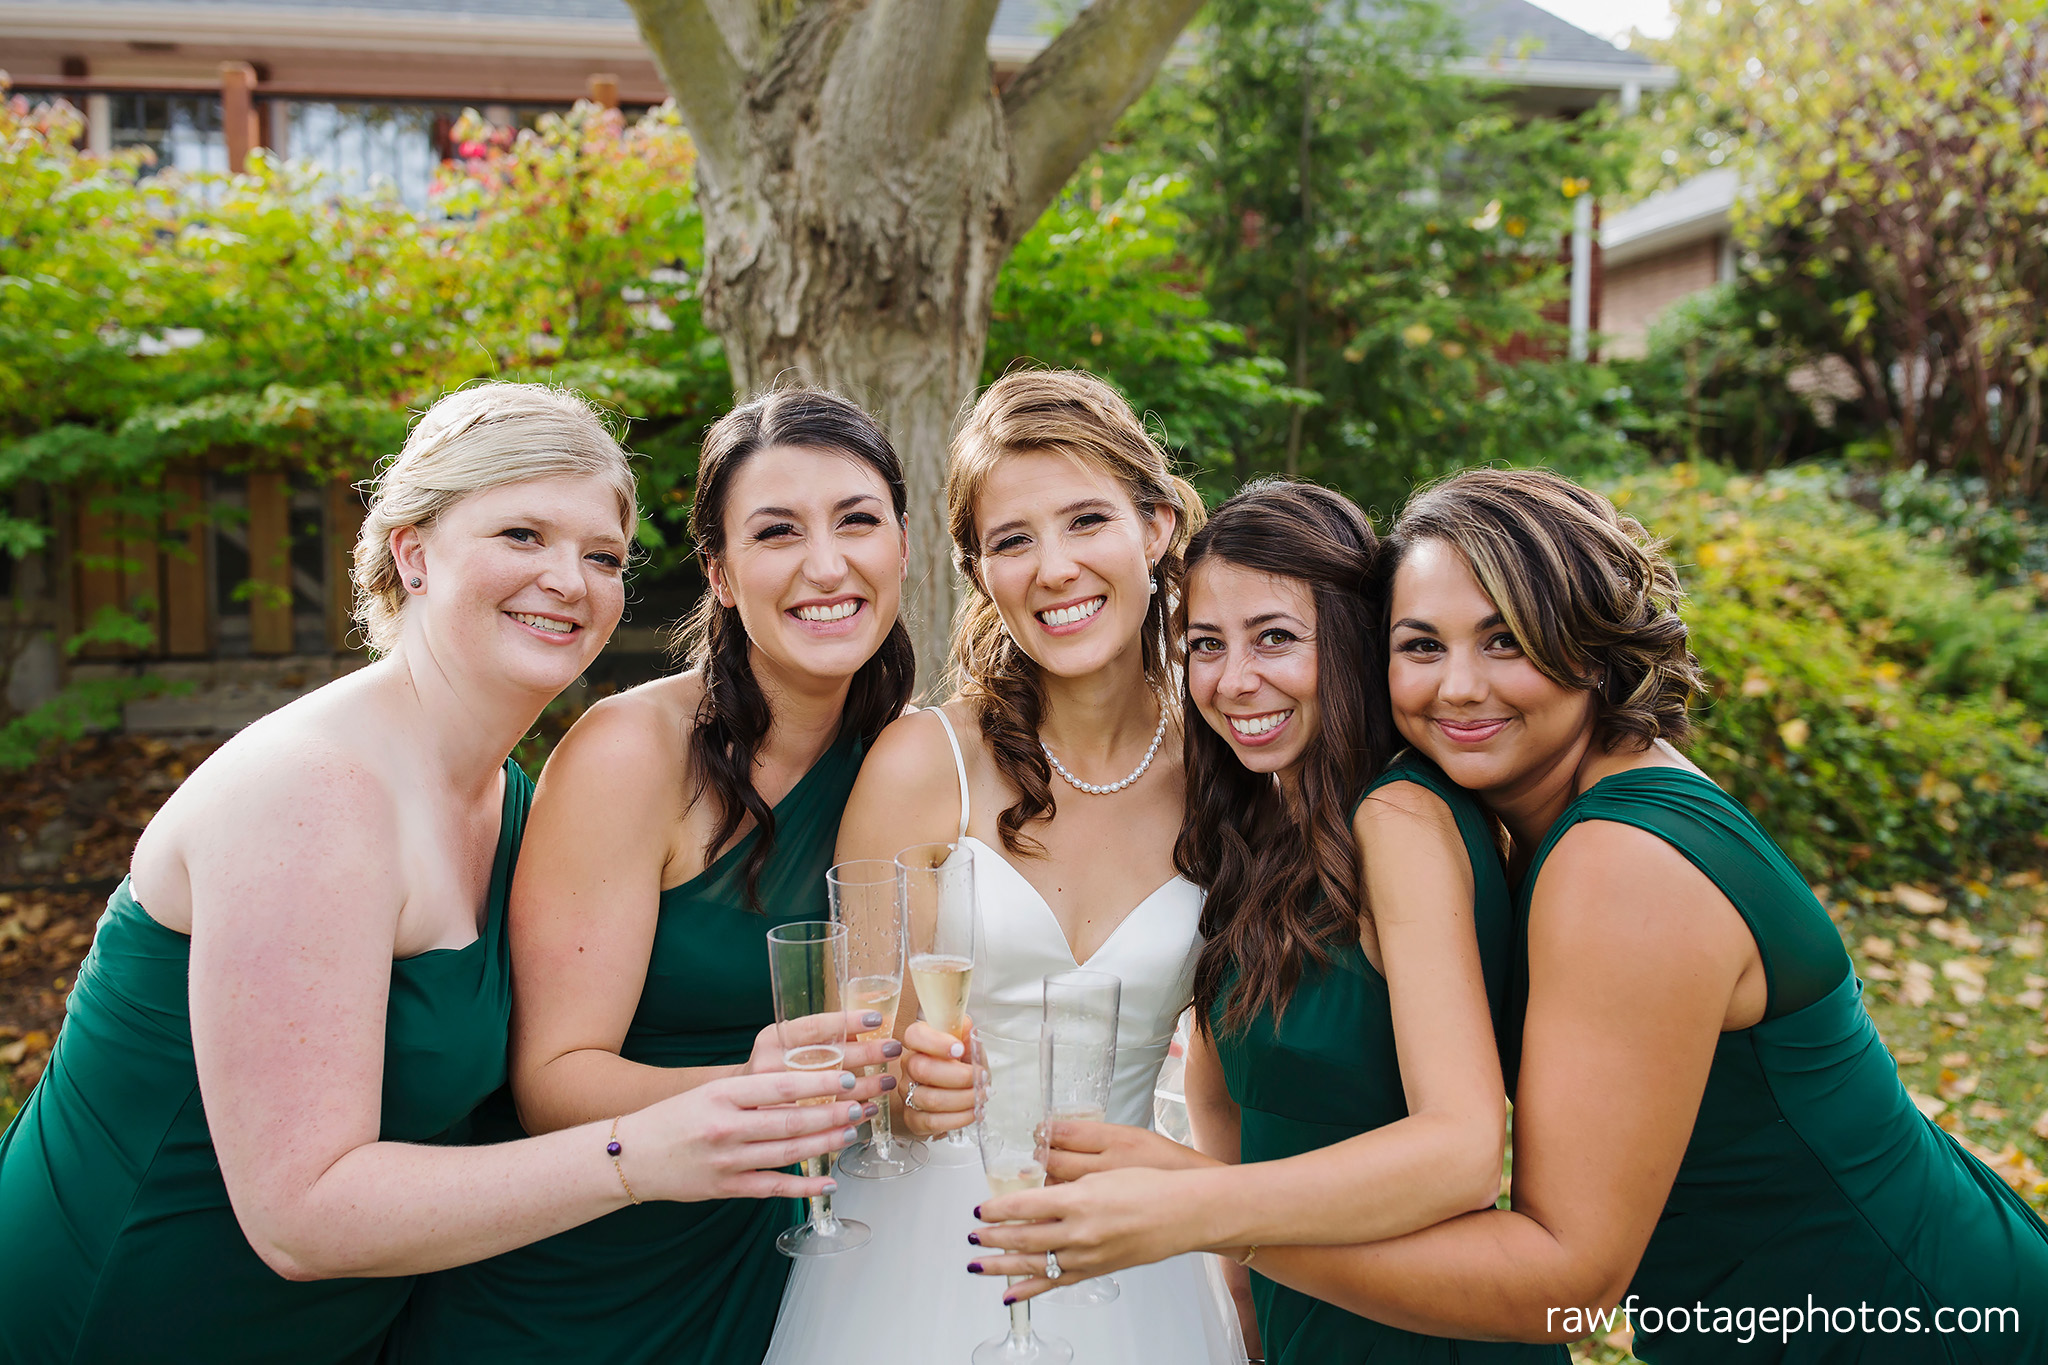 london_ontario_wedding_photographer-civic_gardens-springbank_park-succulent_bouquet-fall_wedding-bridge-raw_footage_photography025.jpg